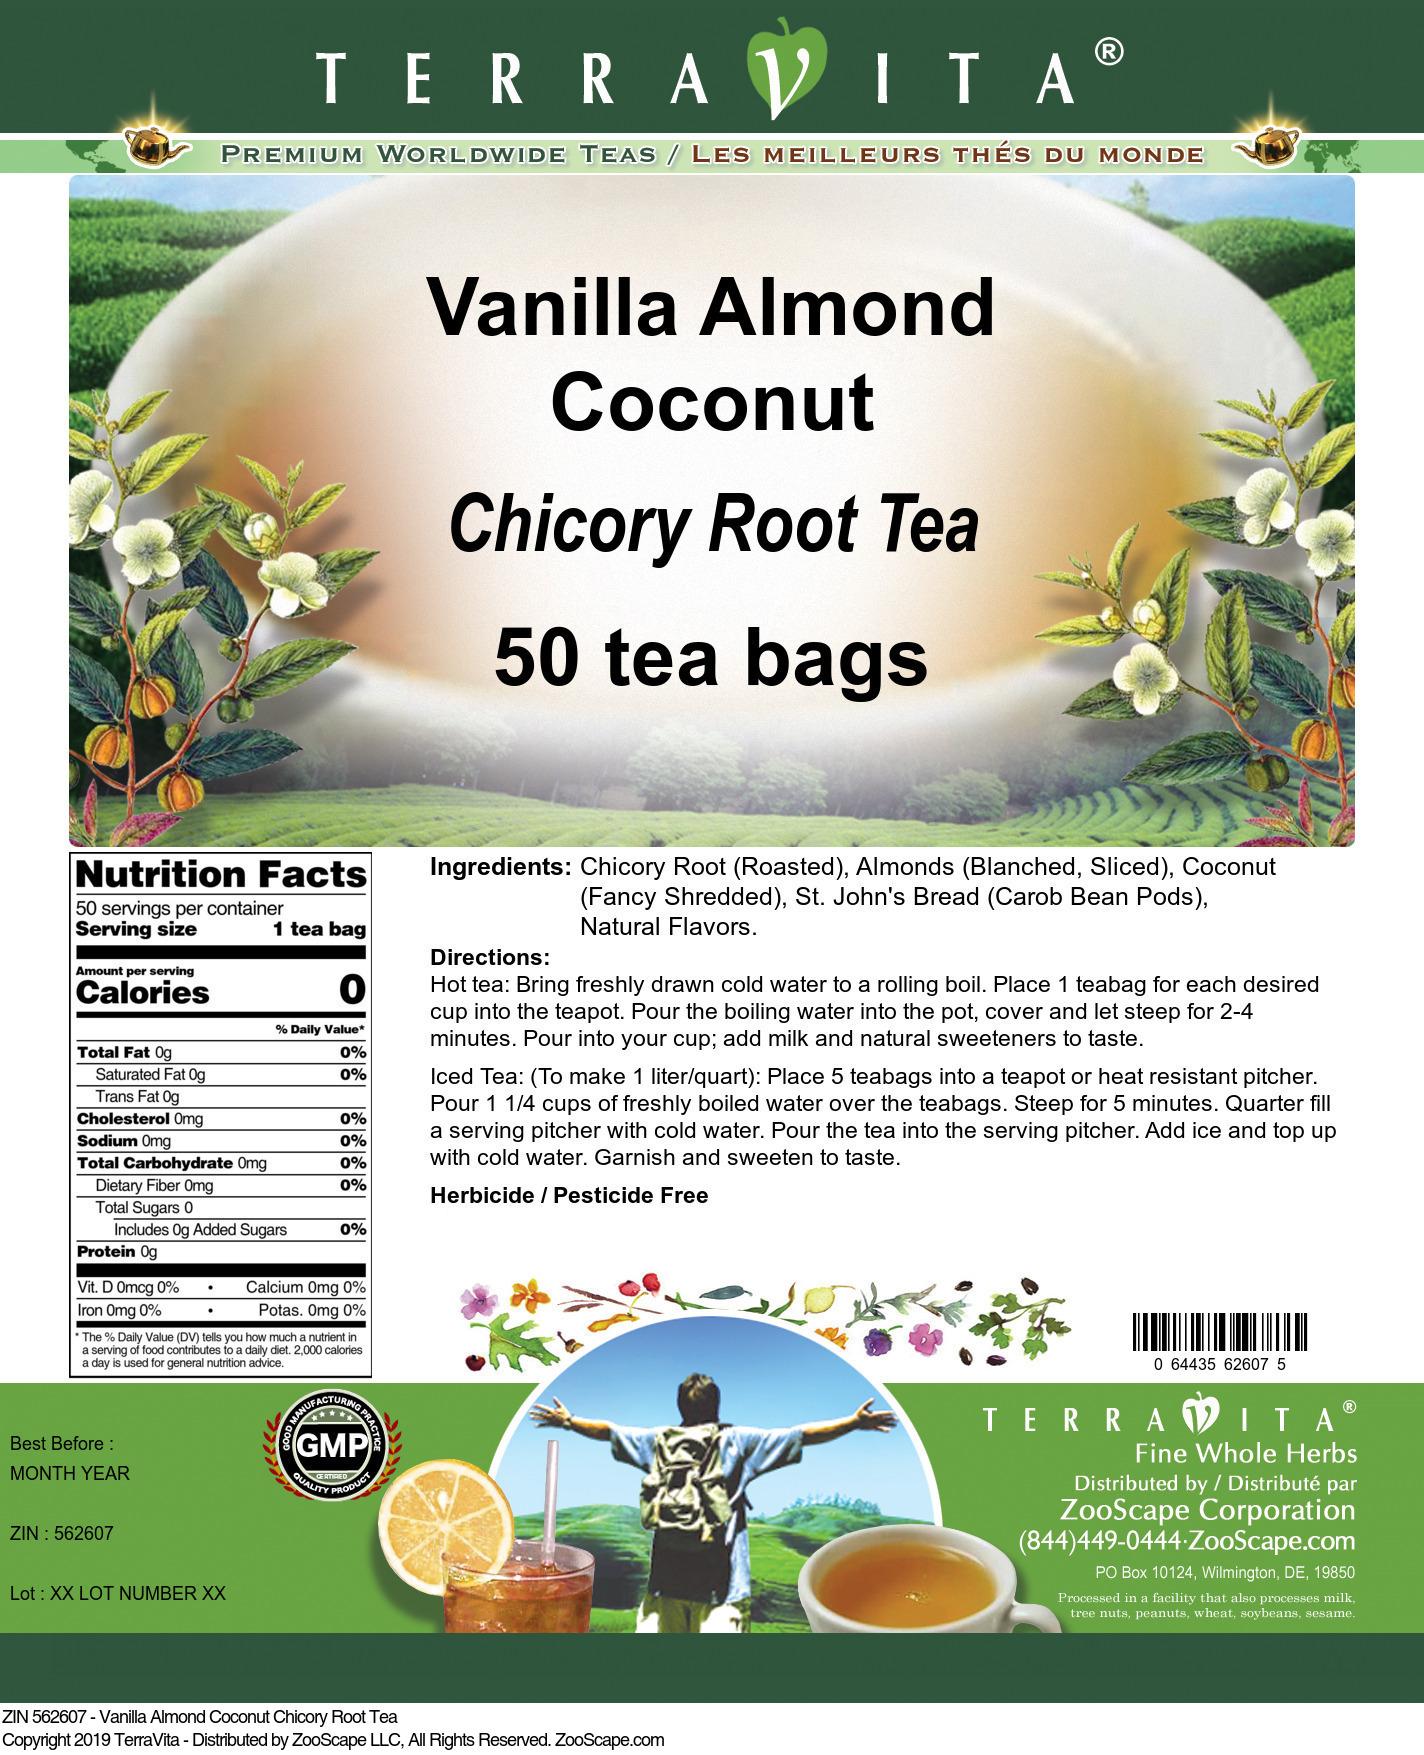 Vanilla Almond Coconut Chicory Root Tea